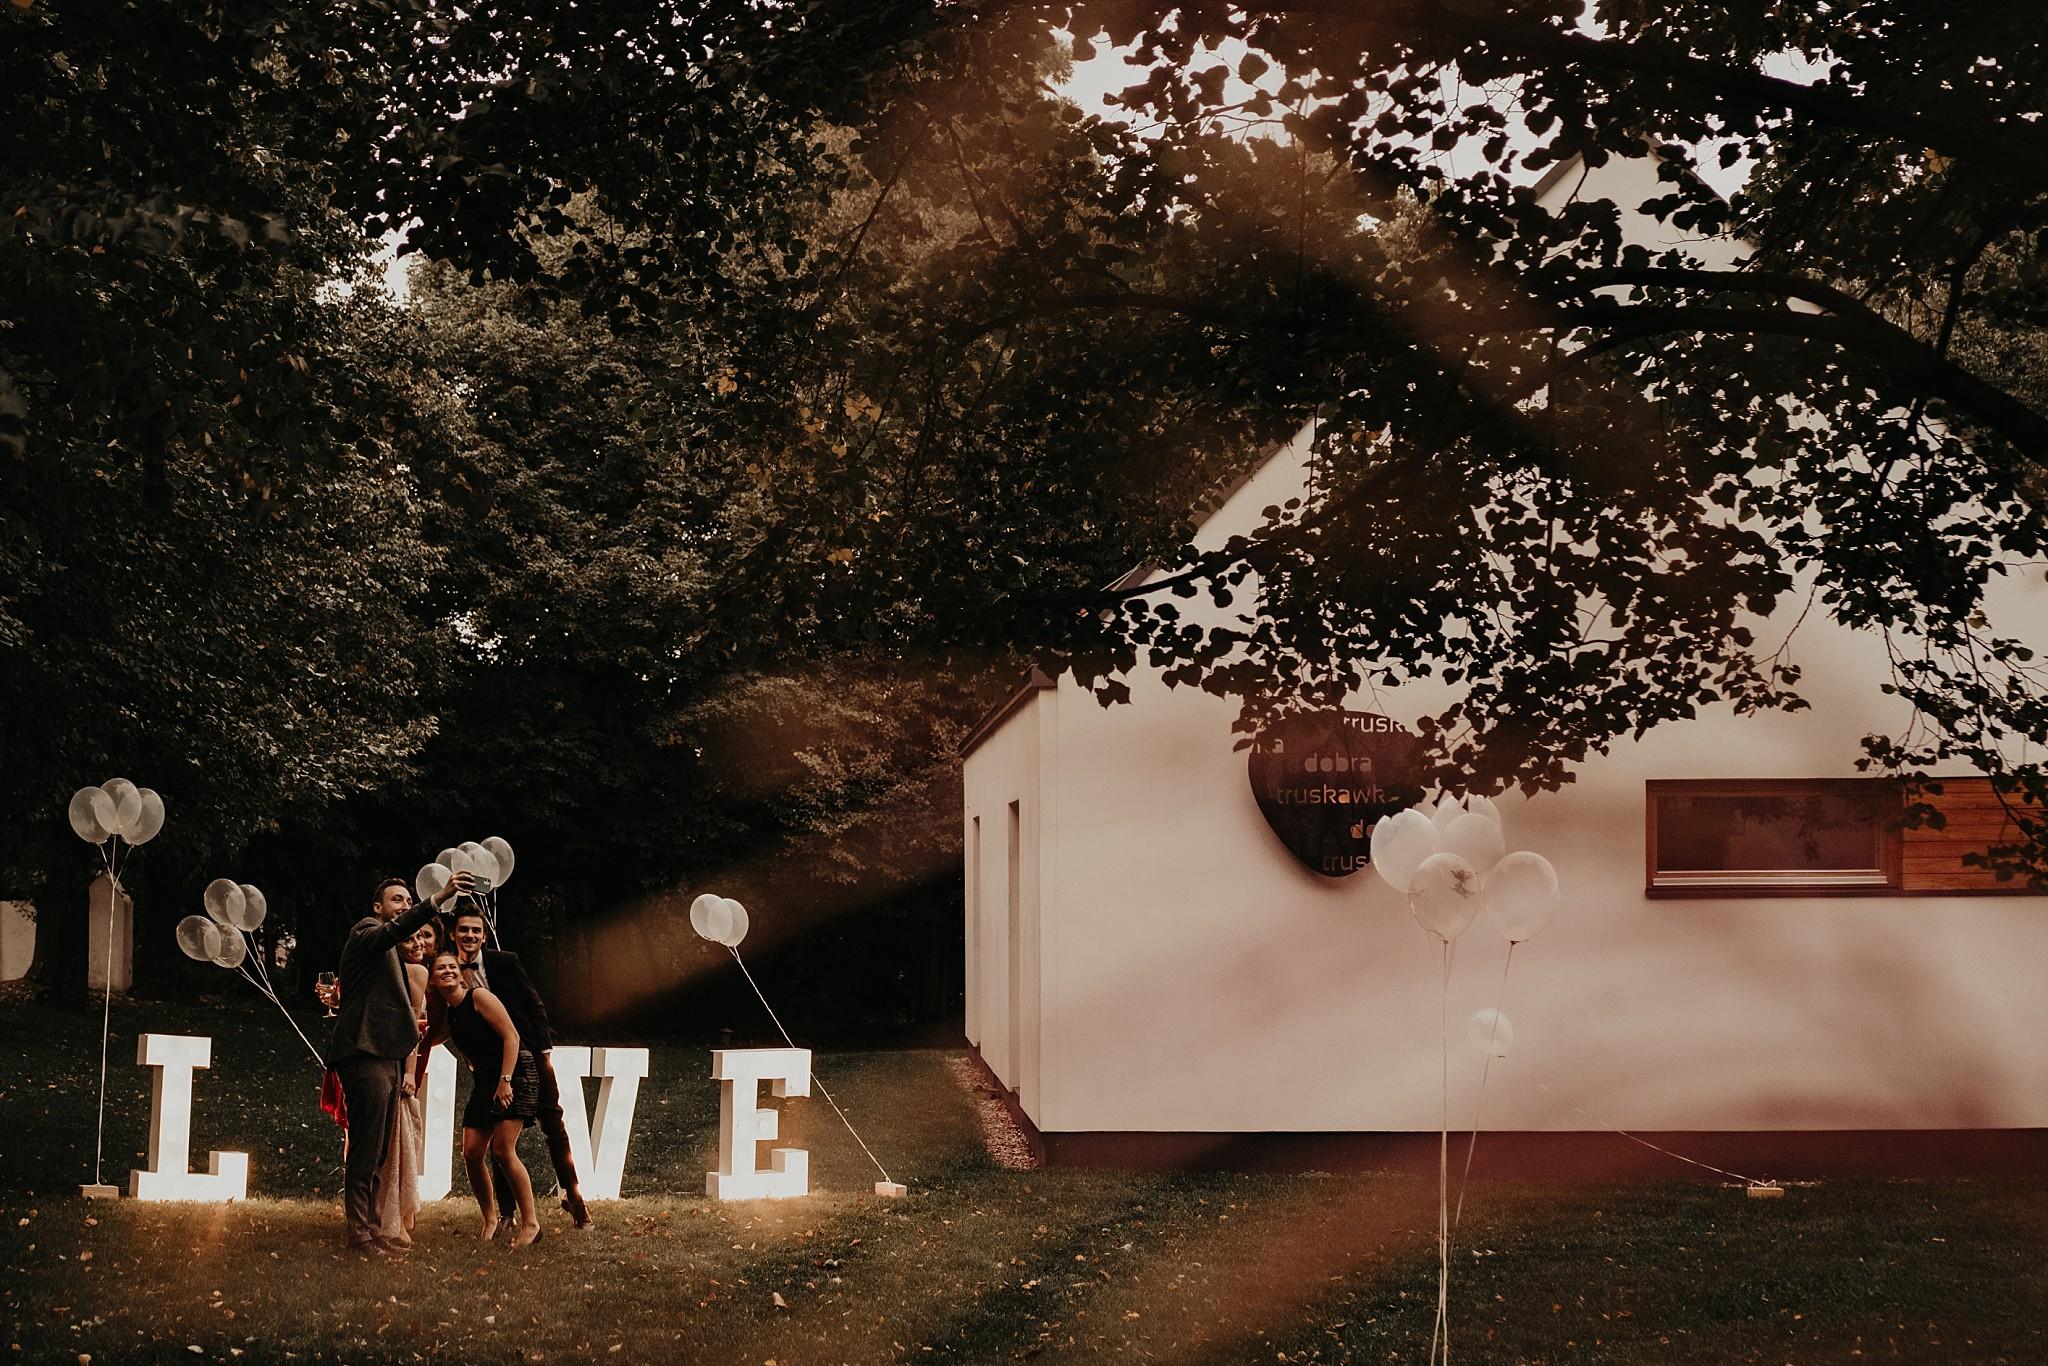 fotograf poznan wesele dobra truskawka piekne wesele pod poznaniem wesele w dobrej truskawce piekna para mloda slub marzen slub koronawirus slub listopad wesele koronawirus 336